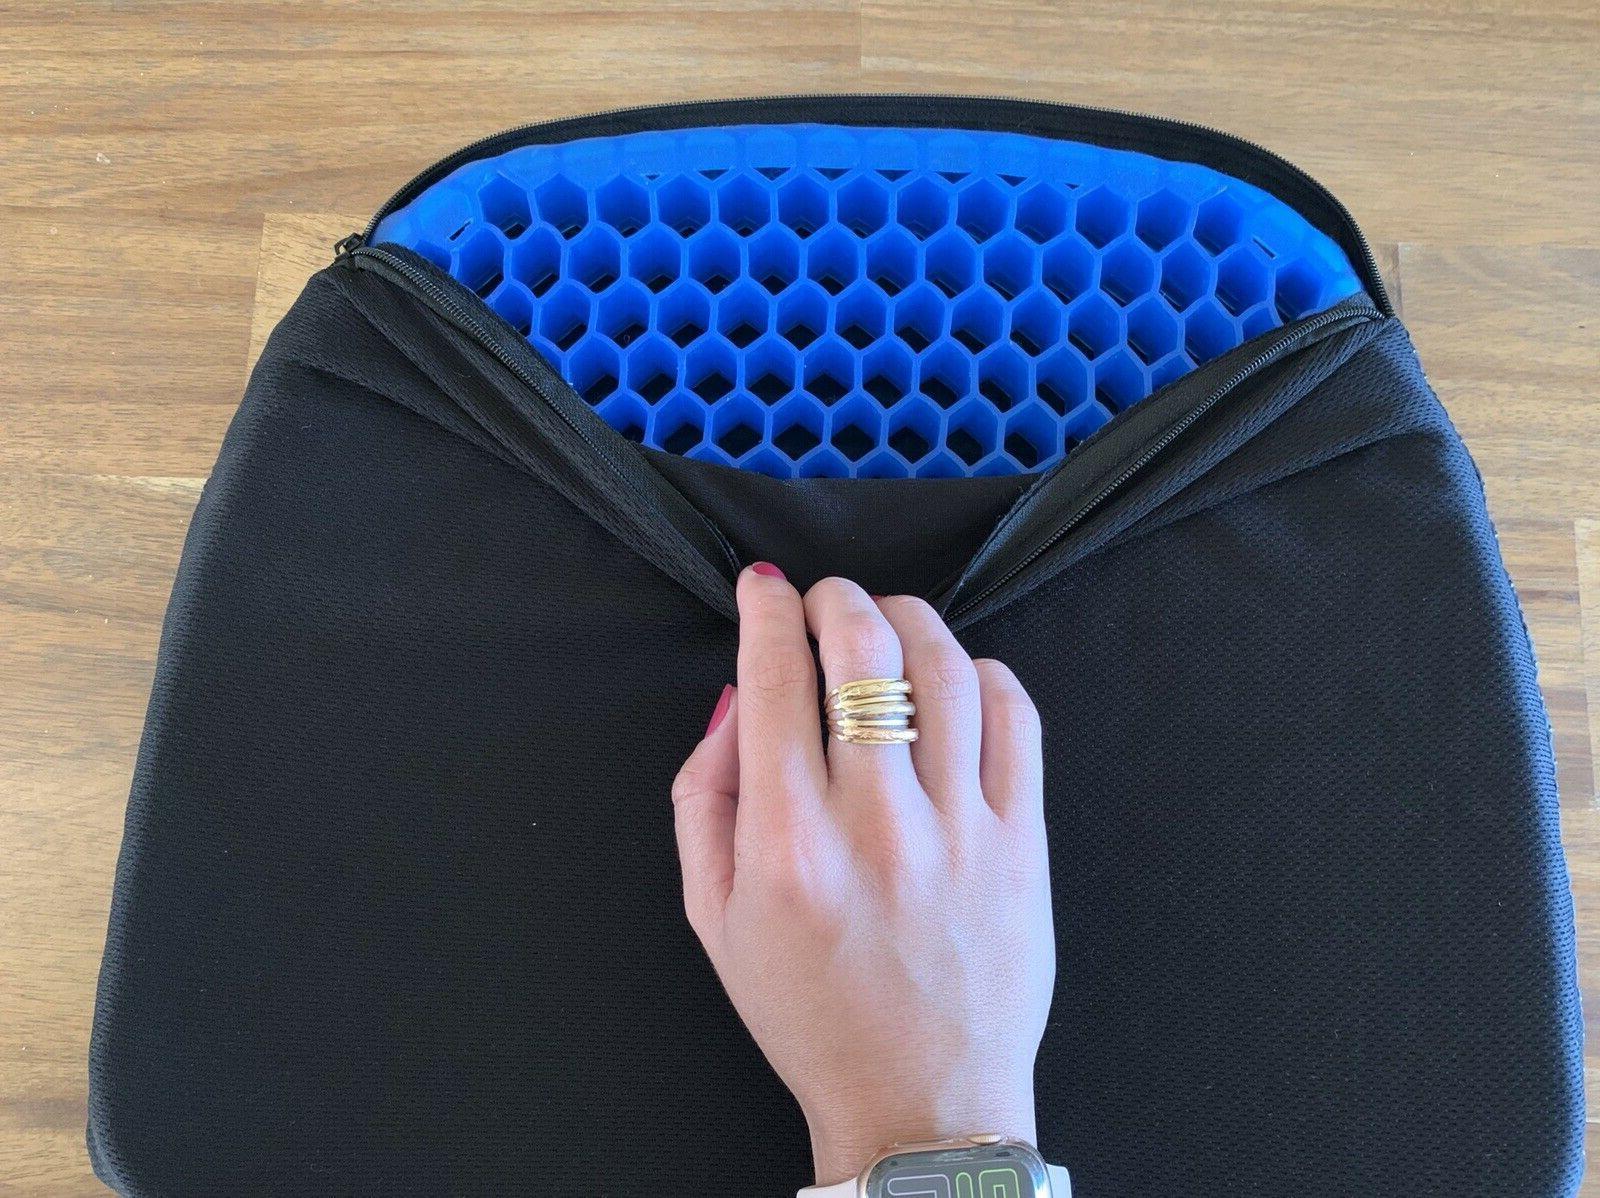 Honeycomb Gel Flex Cushion Seat Sitter Pillow Back Support FREE